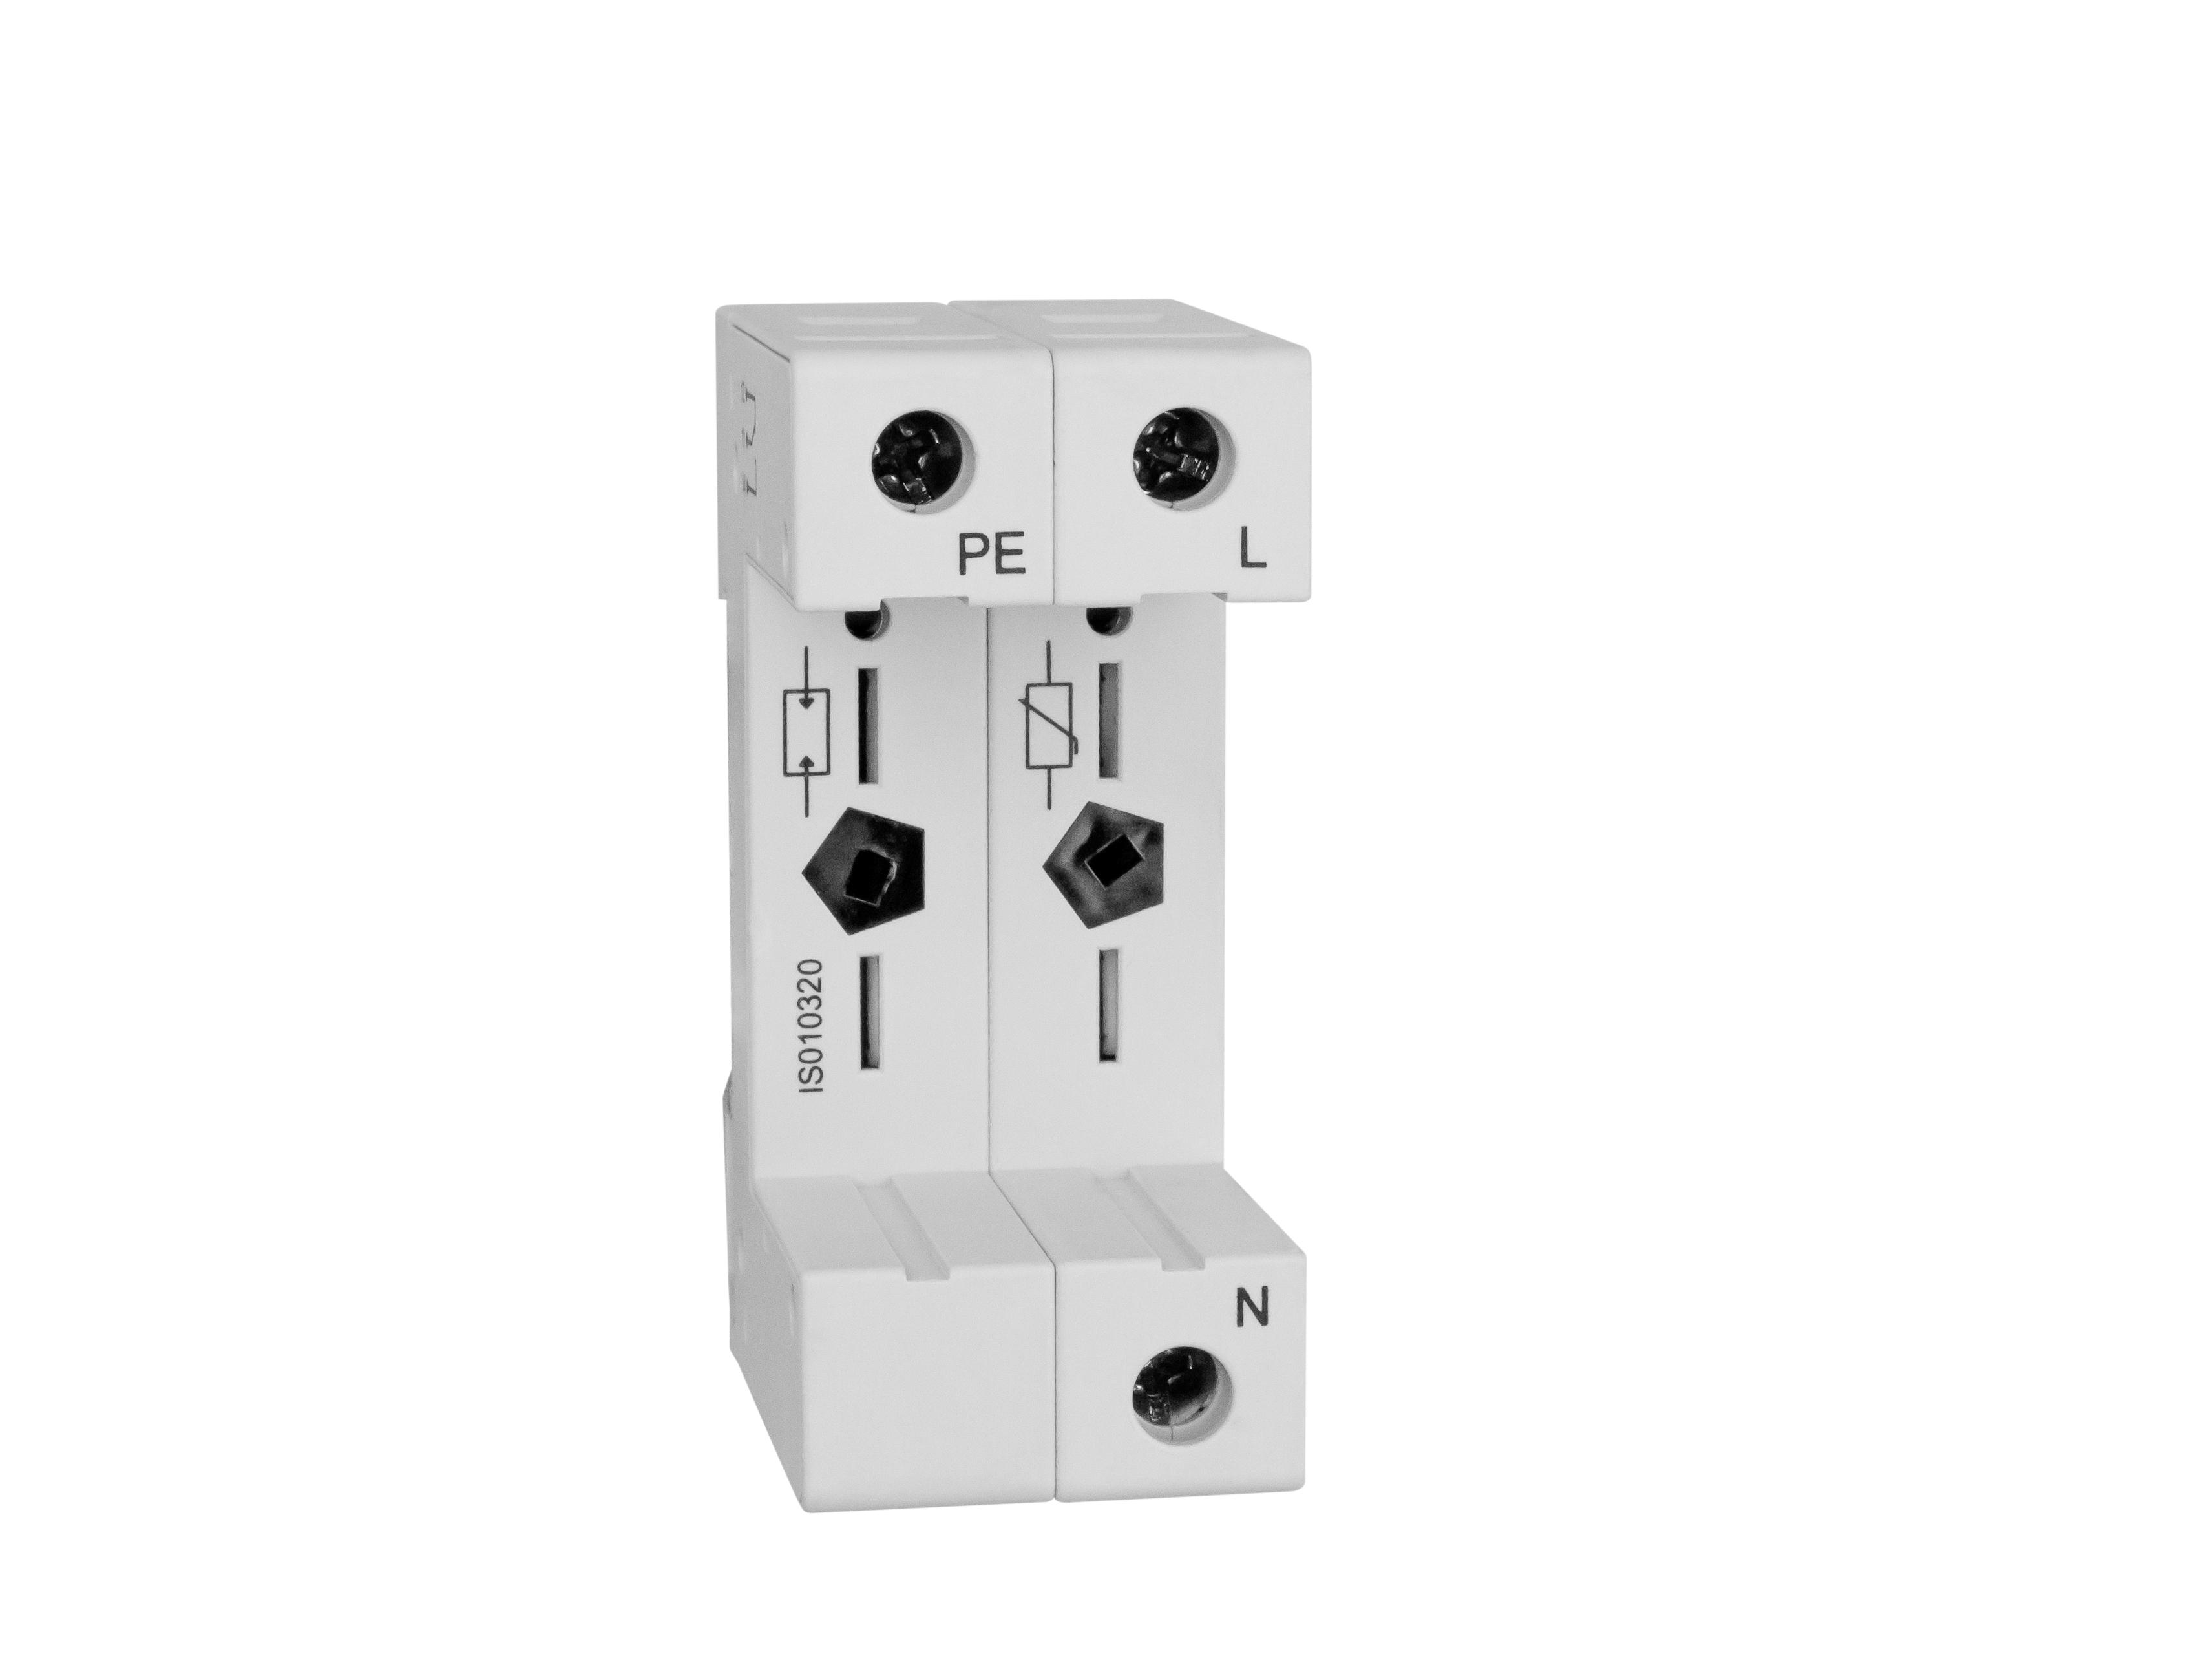 1 Stk Vartec TII, Sockel 1+1 (für 1 VVM, 1 VGM), ohne Hilfskontakt IS010320--